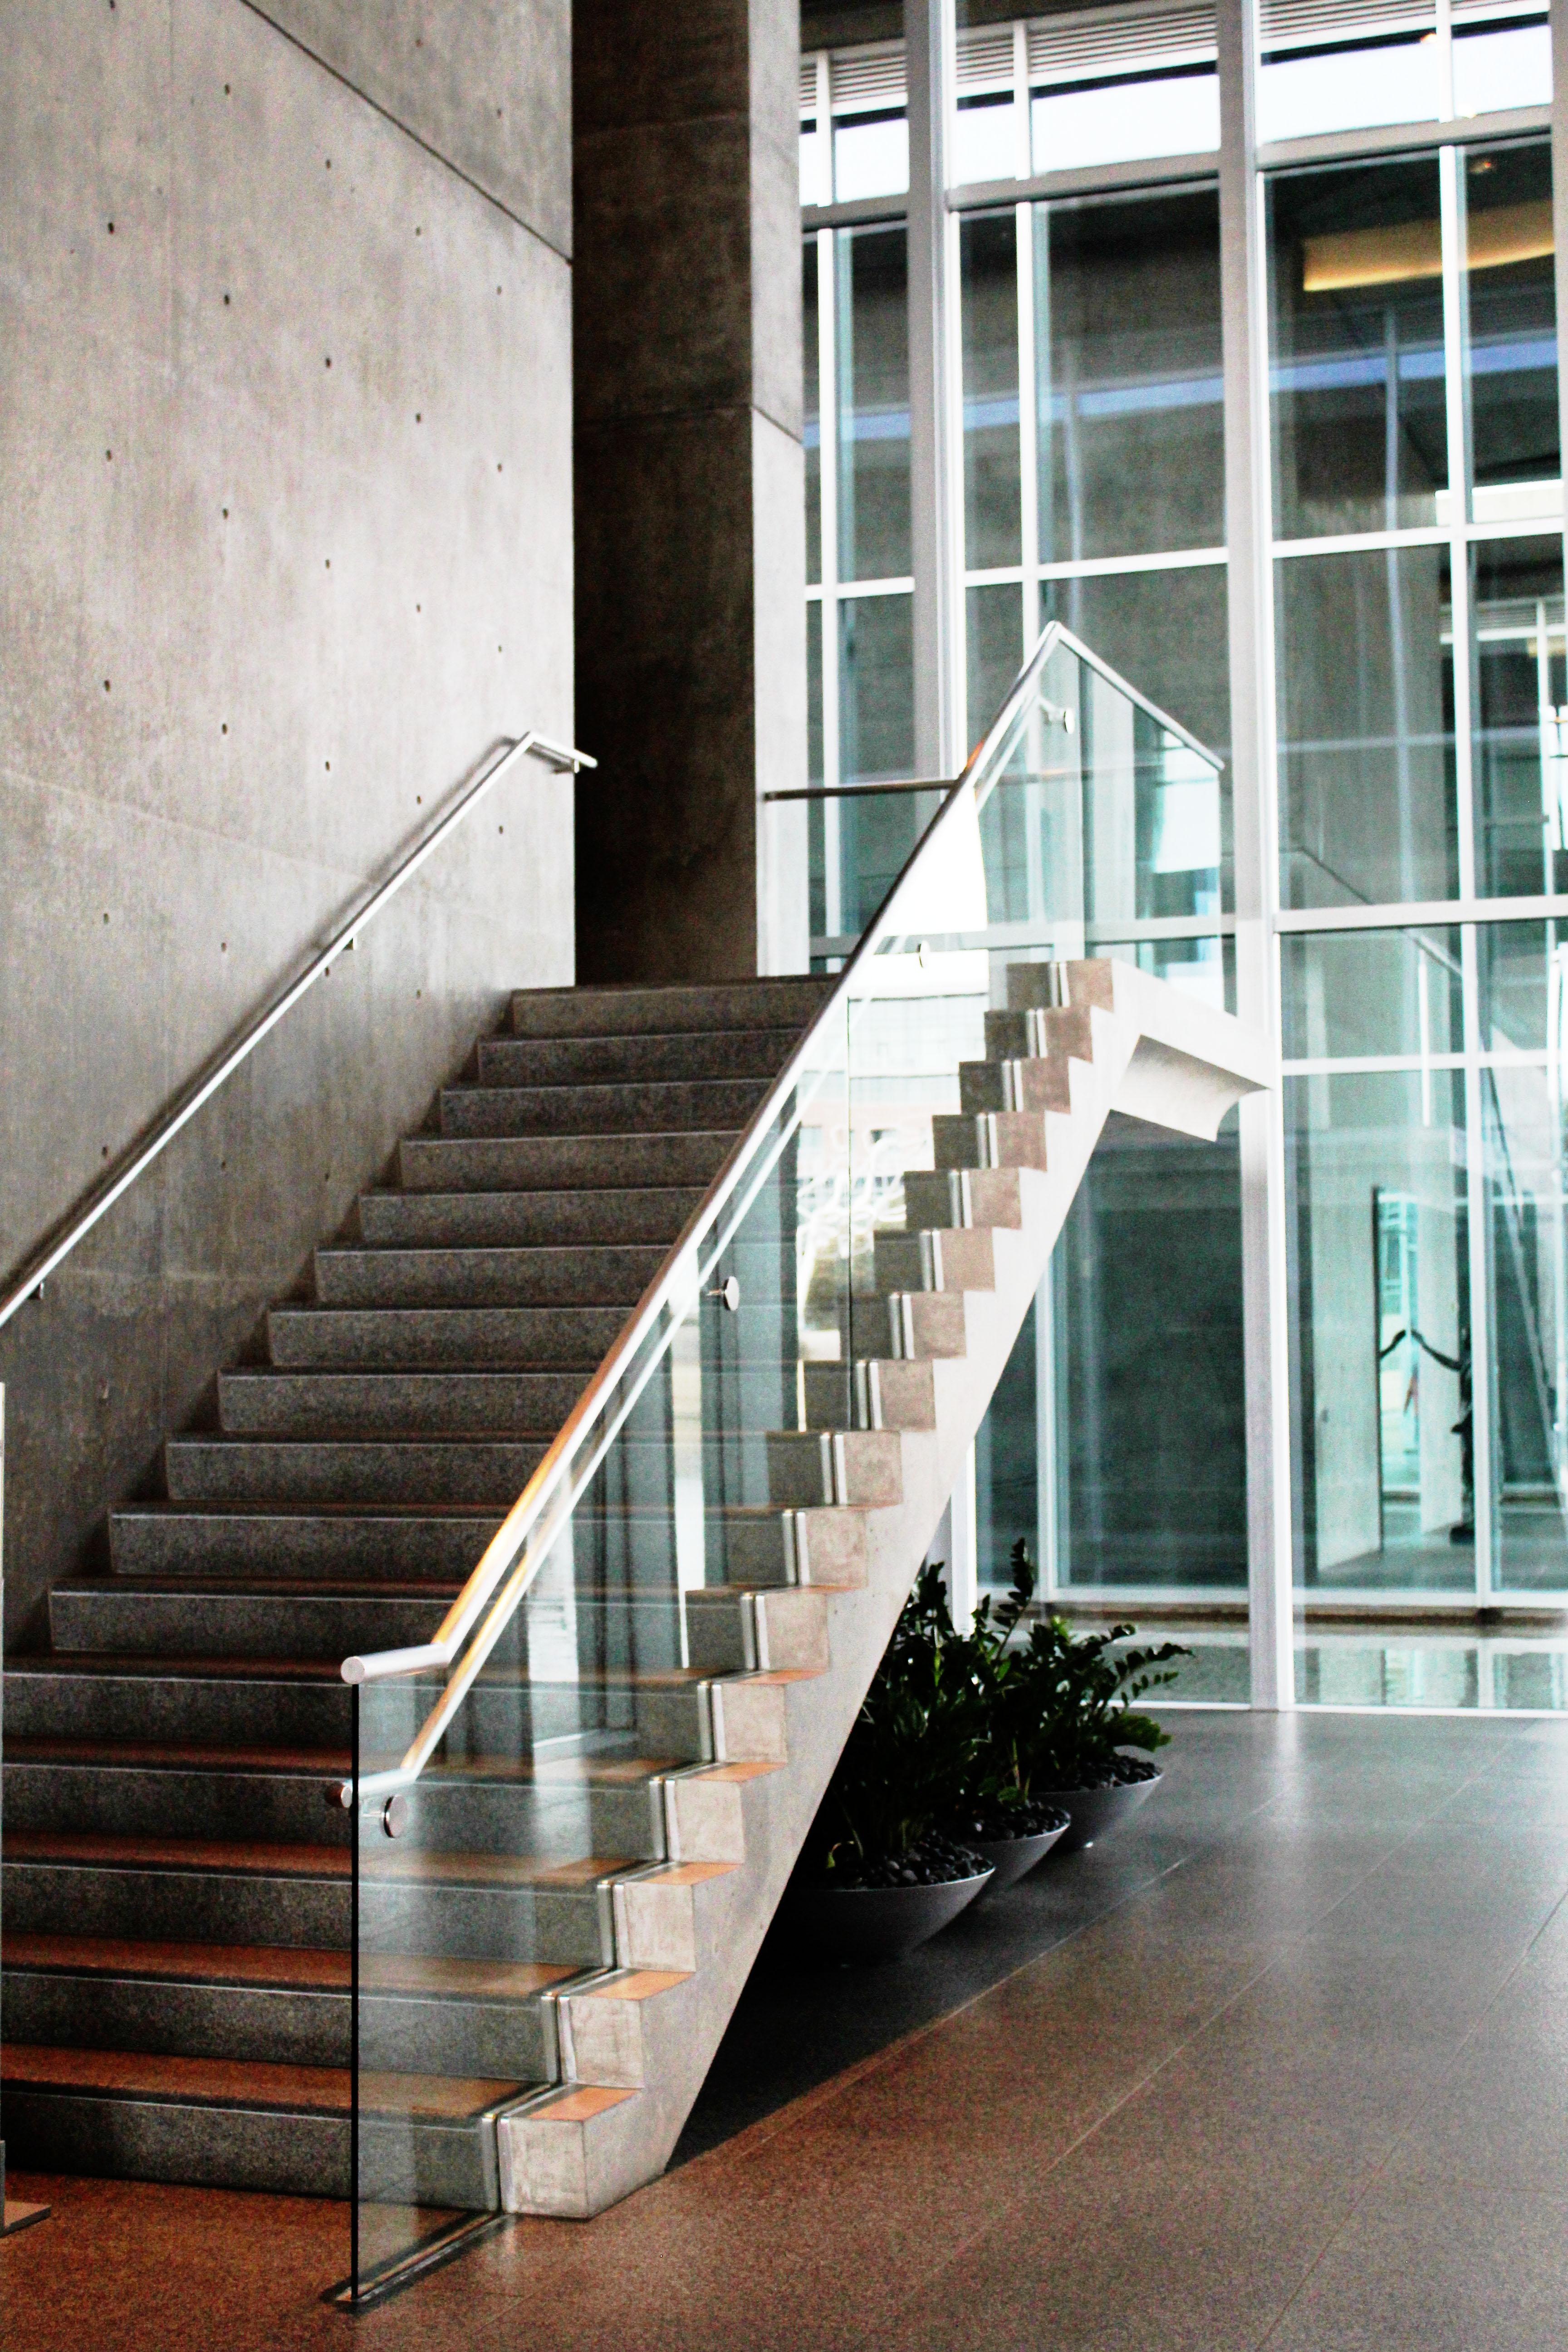 MoMA, Fort Worth - Photo Essay by Amit Khanna (25).JPG